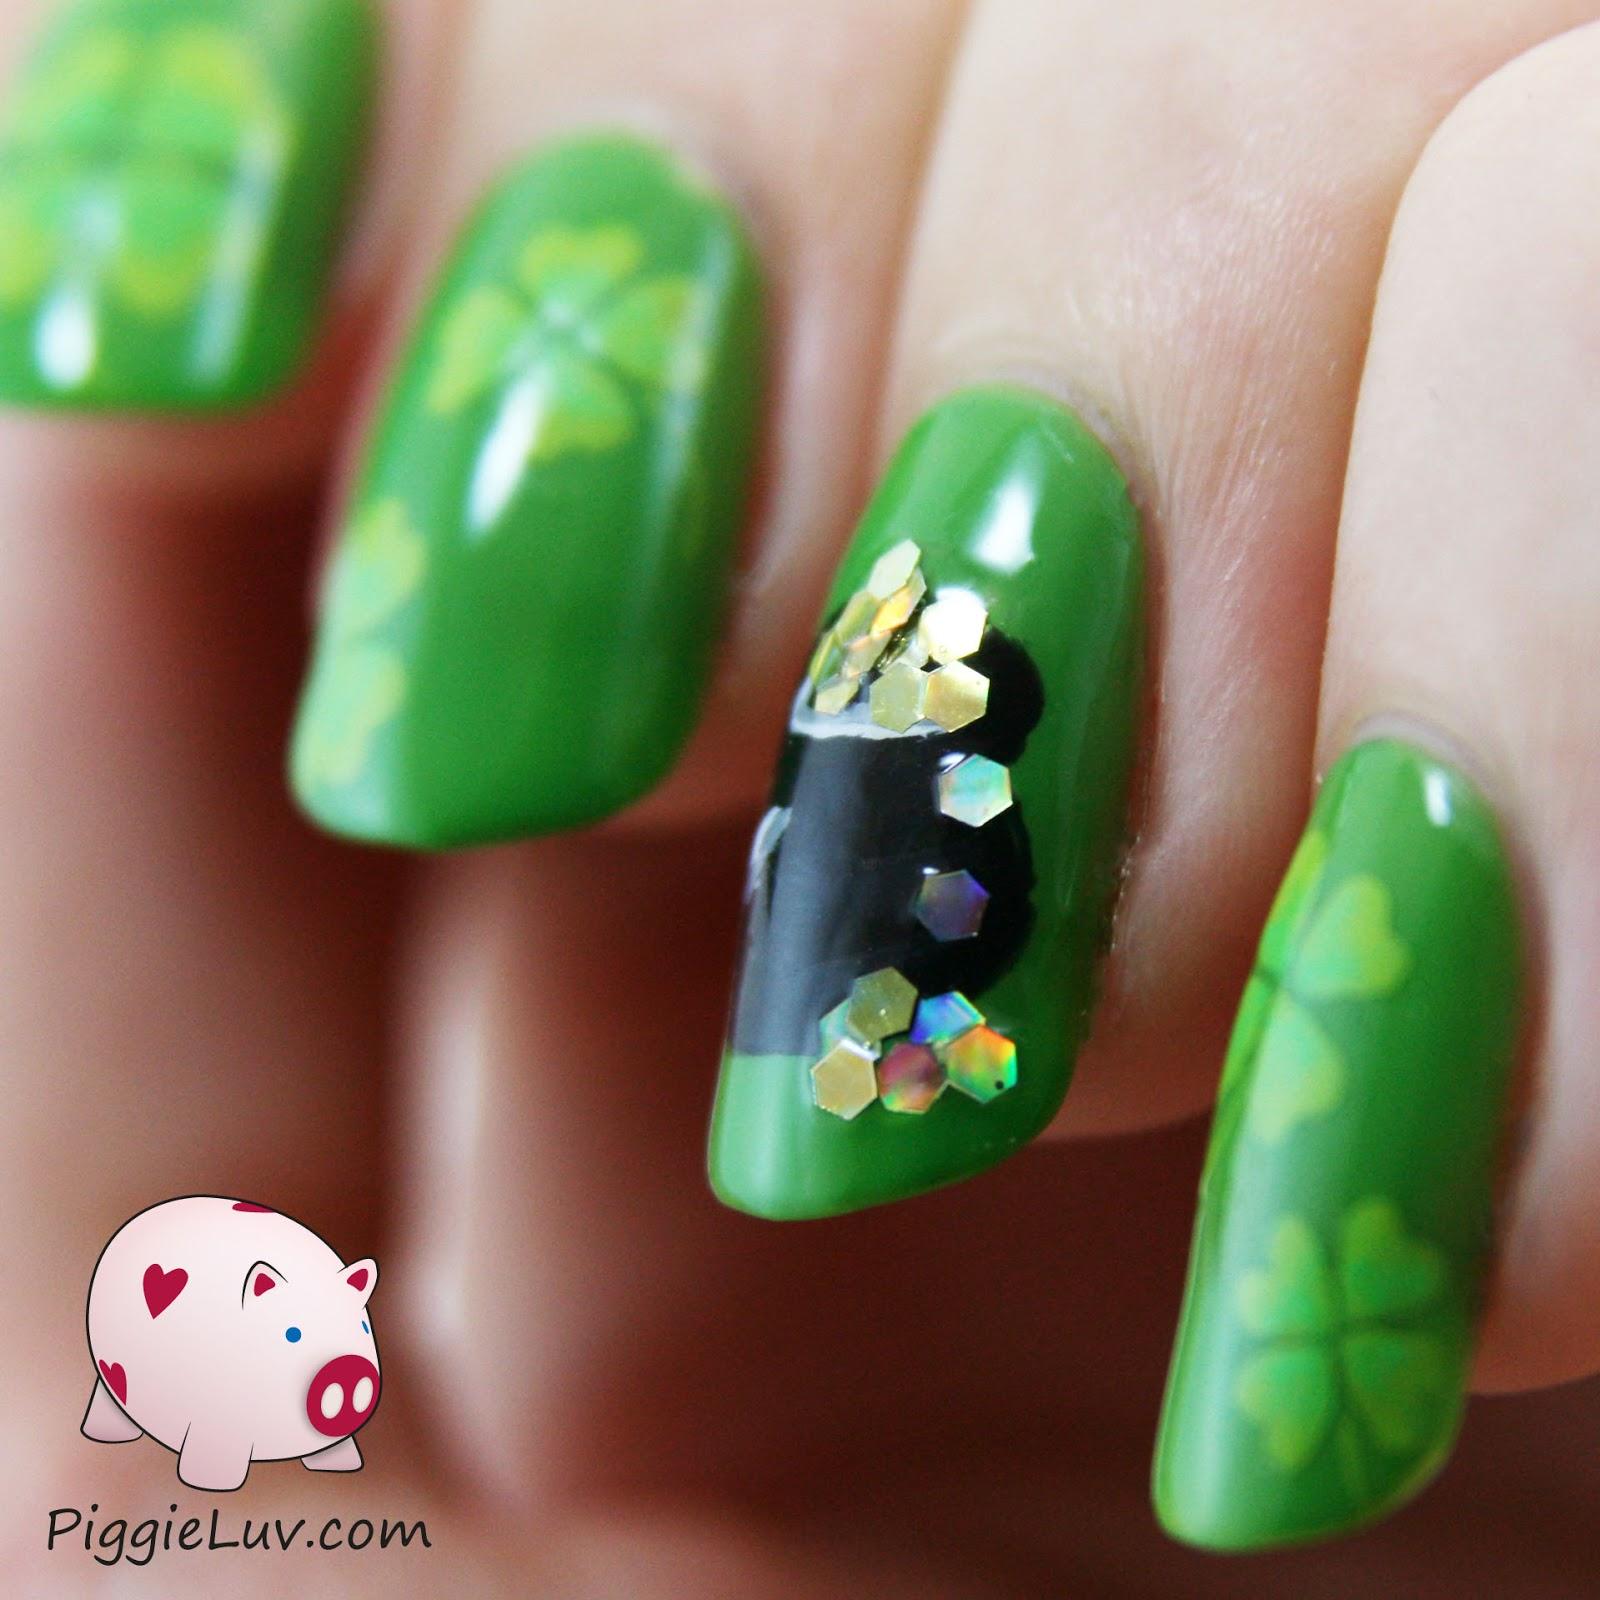 Piggieluv st patricks day nail art st patricks day nail art prinsesfo Images